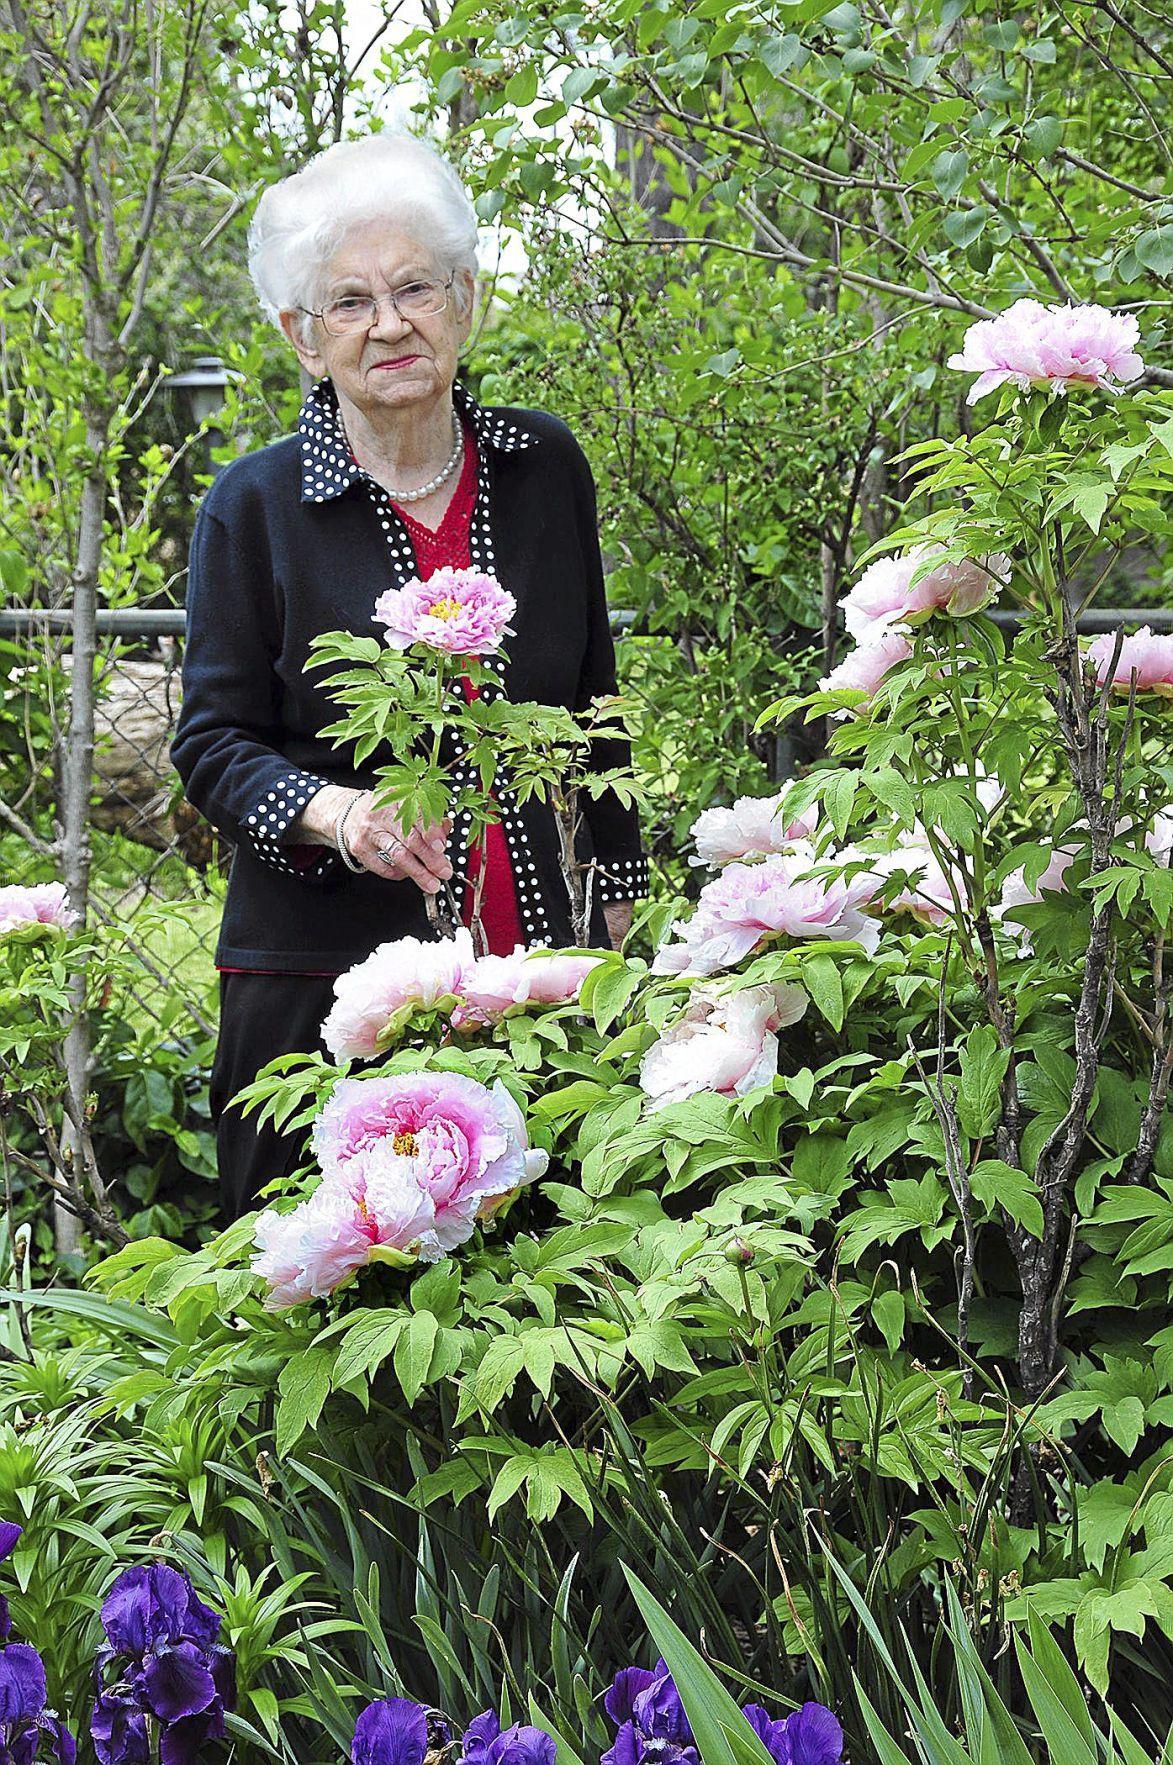 Master Gardener Assisting The Elderly With Gardening